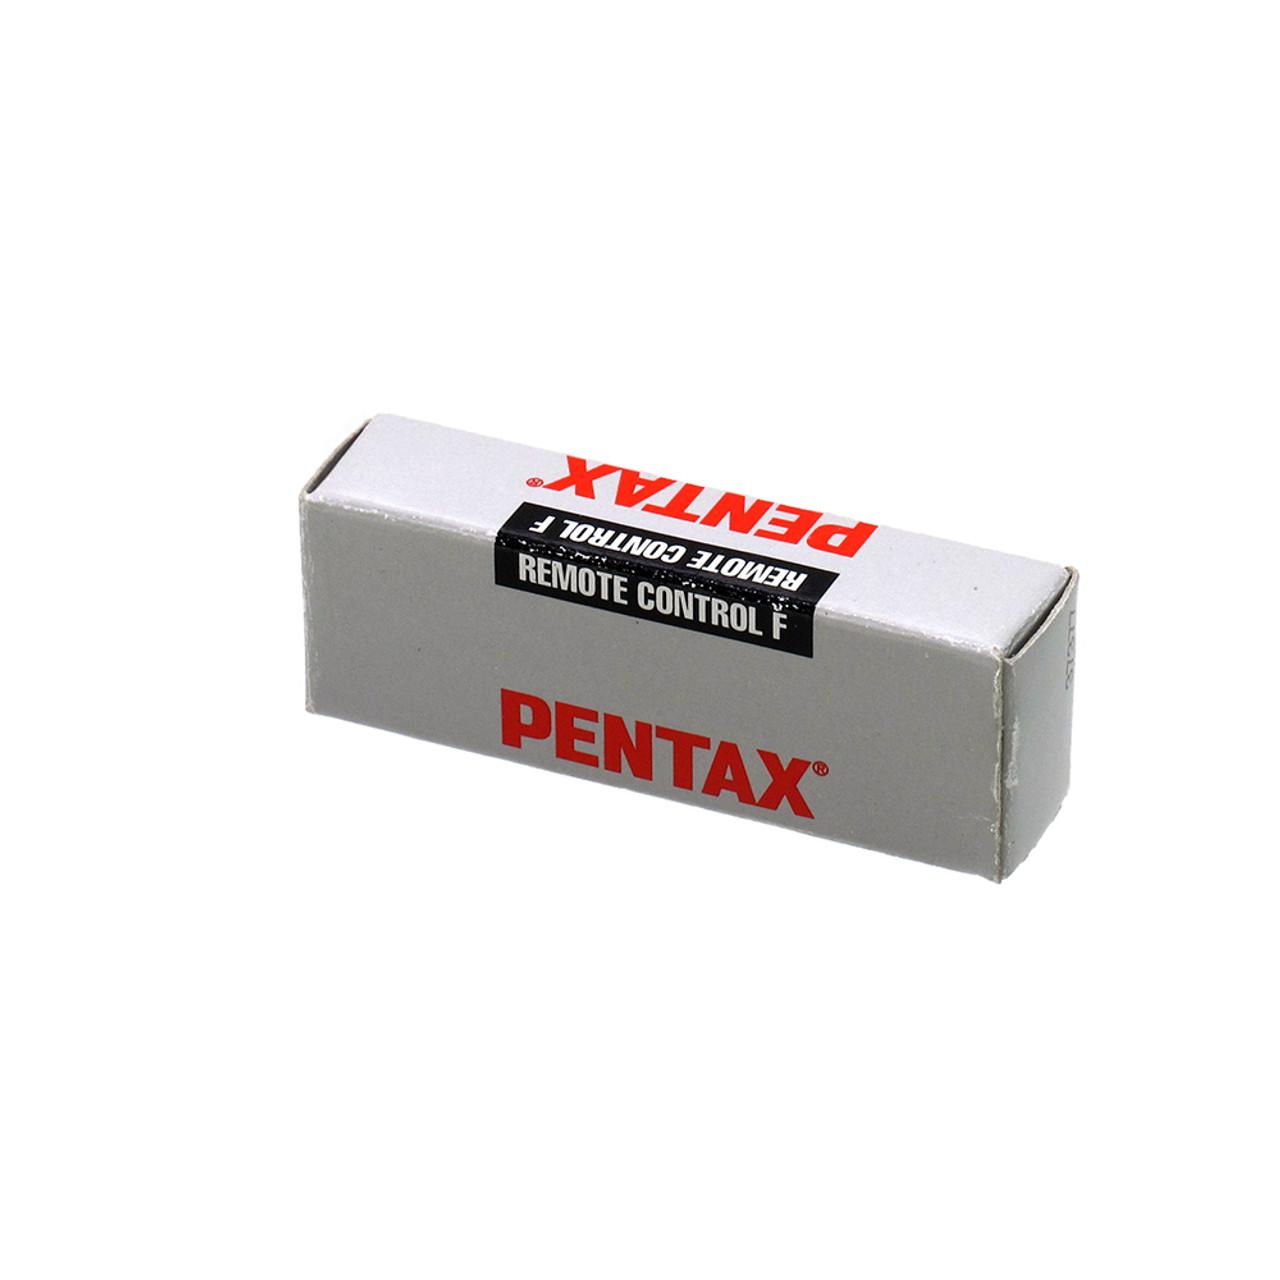 USED PENTAX I.R. REMOTE RELEAS